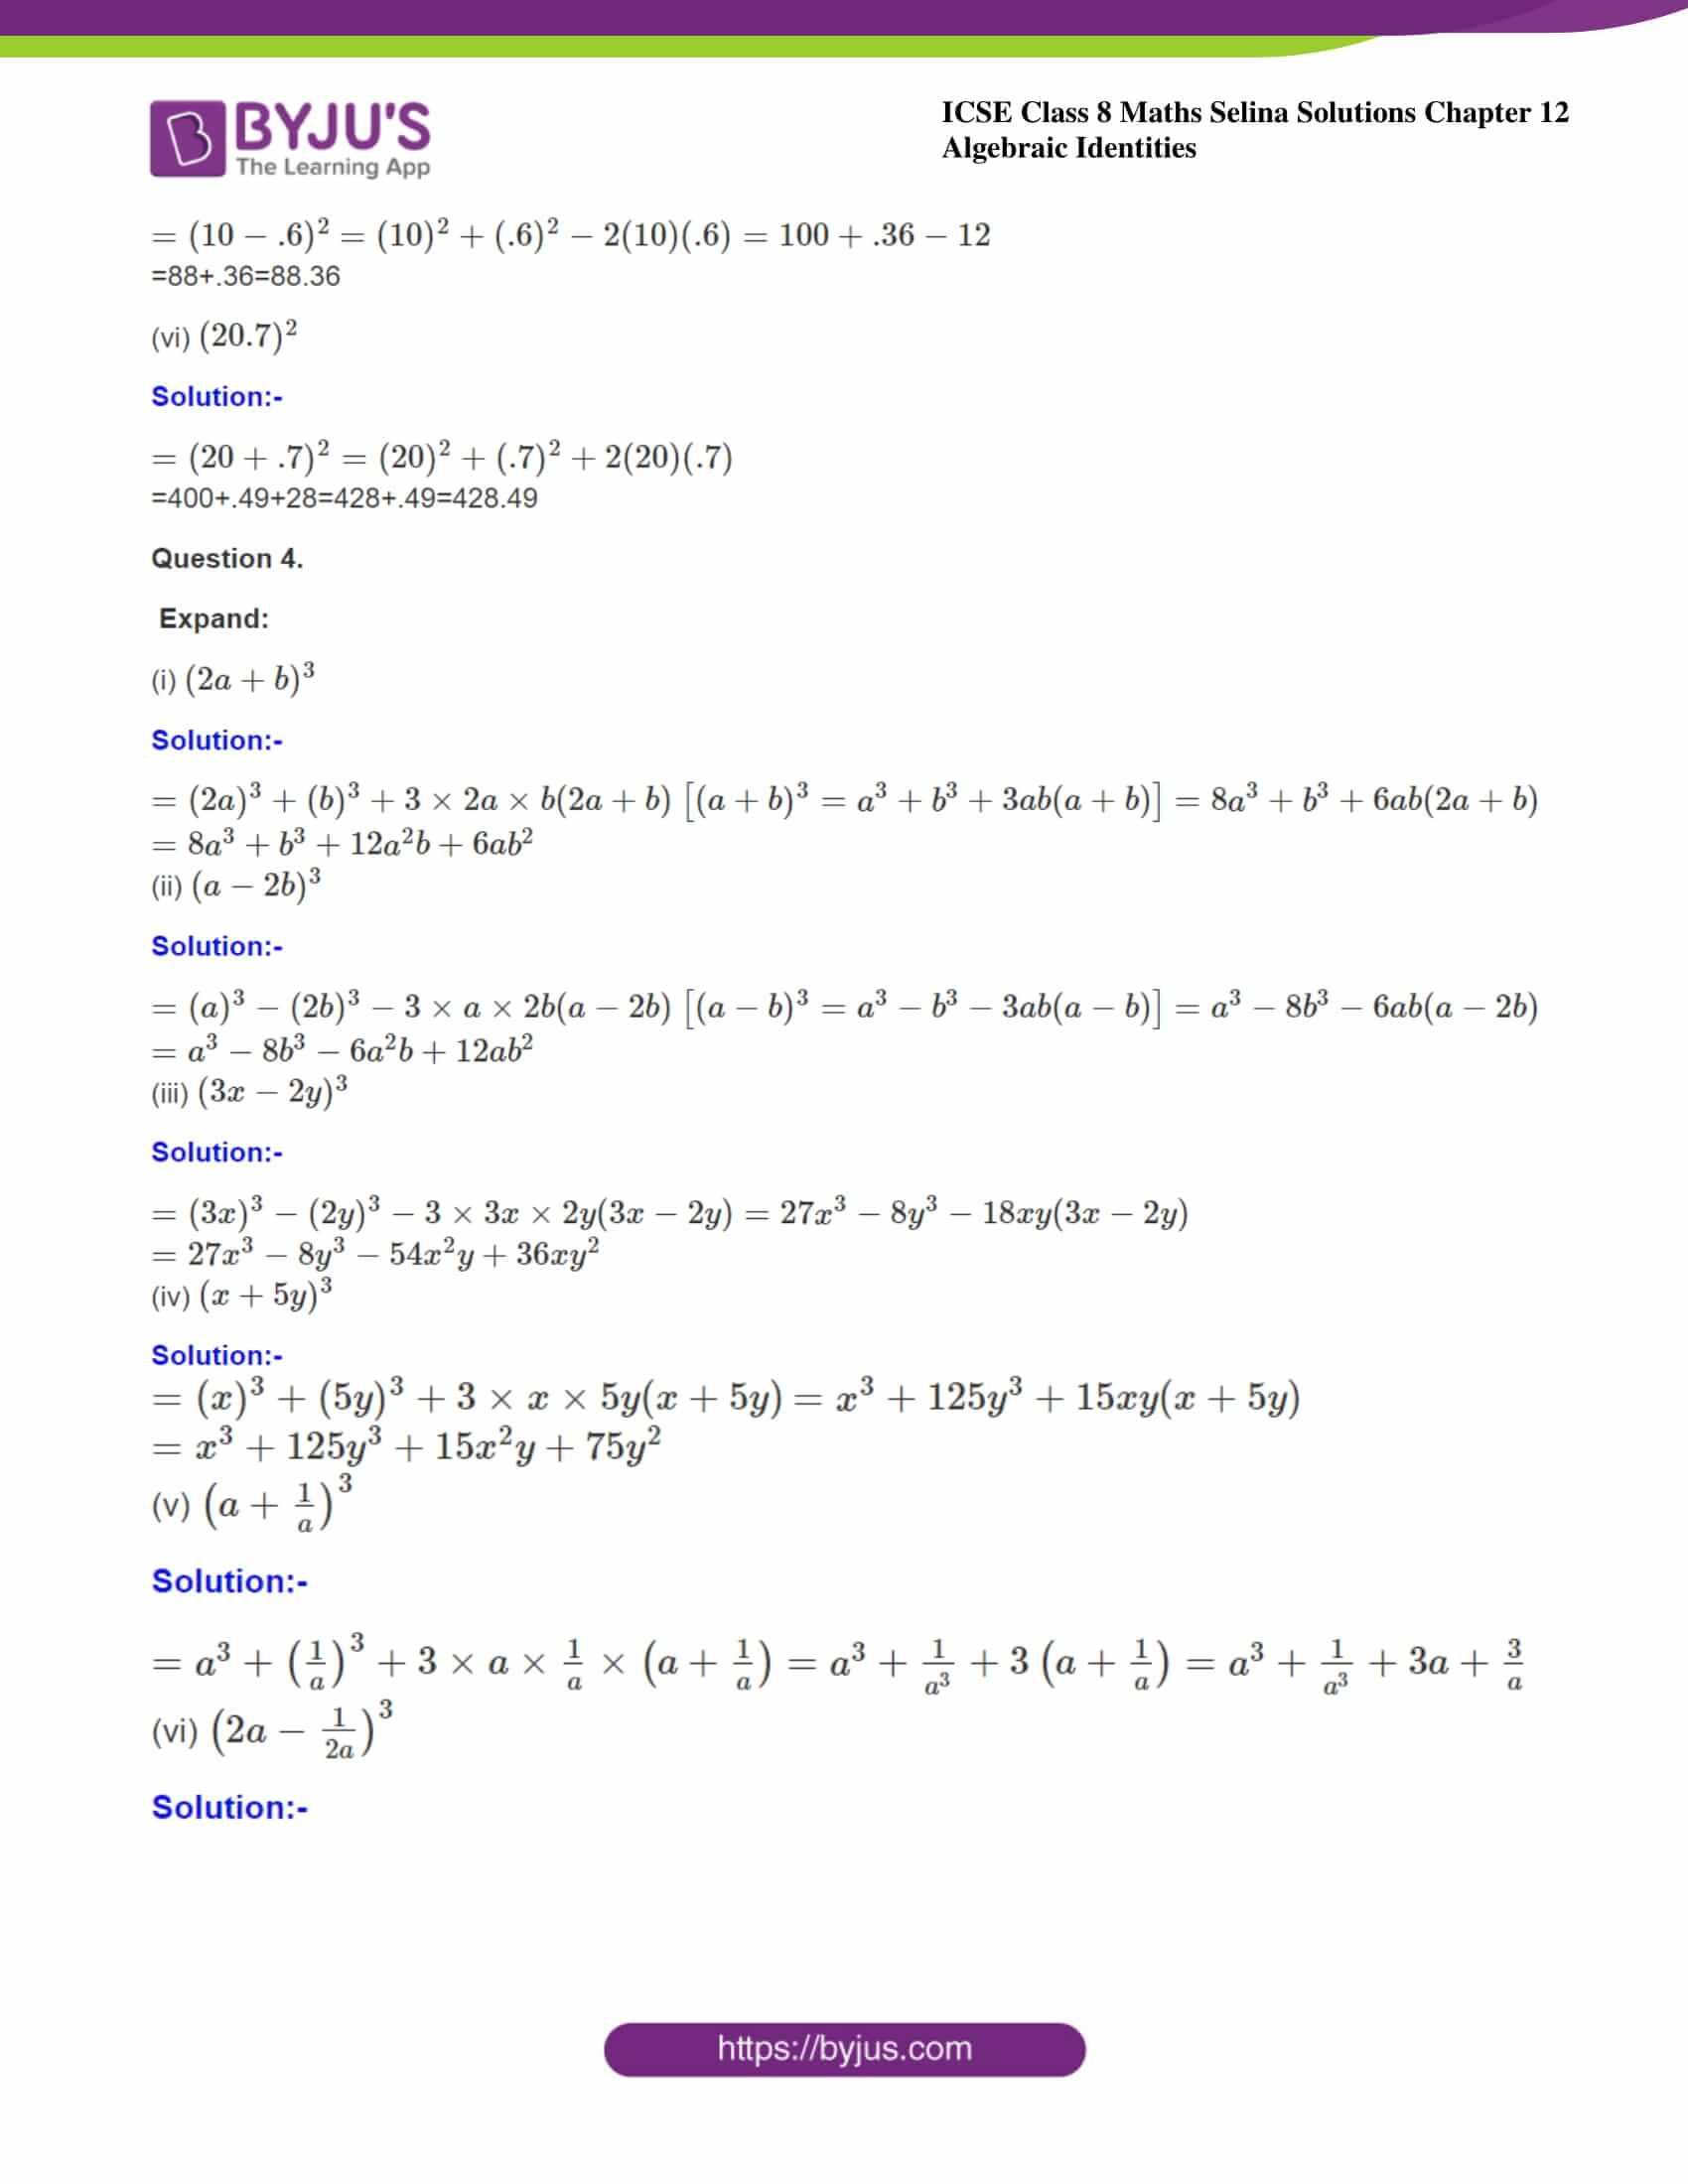 icse class 8 maths may3 selina solutions chapter 12 algebraic identities 09